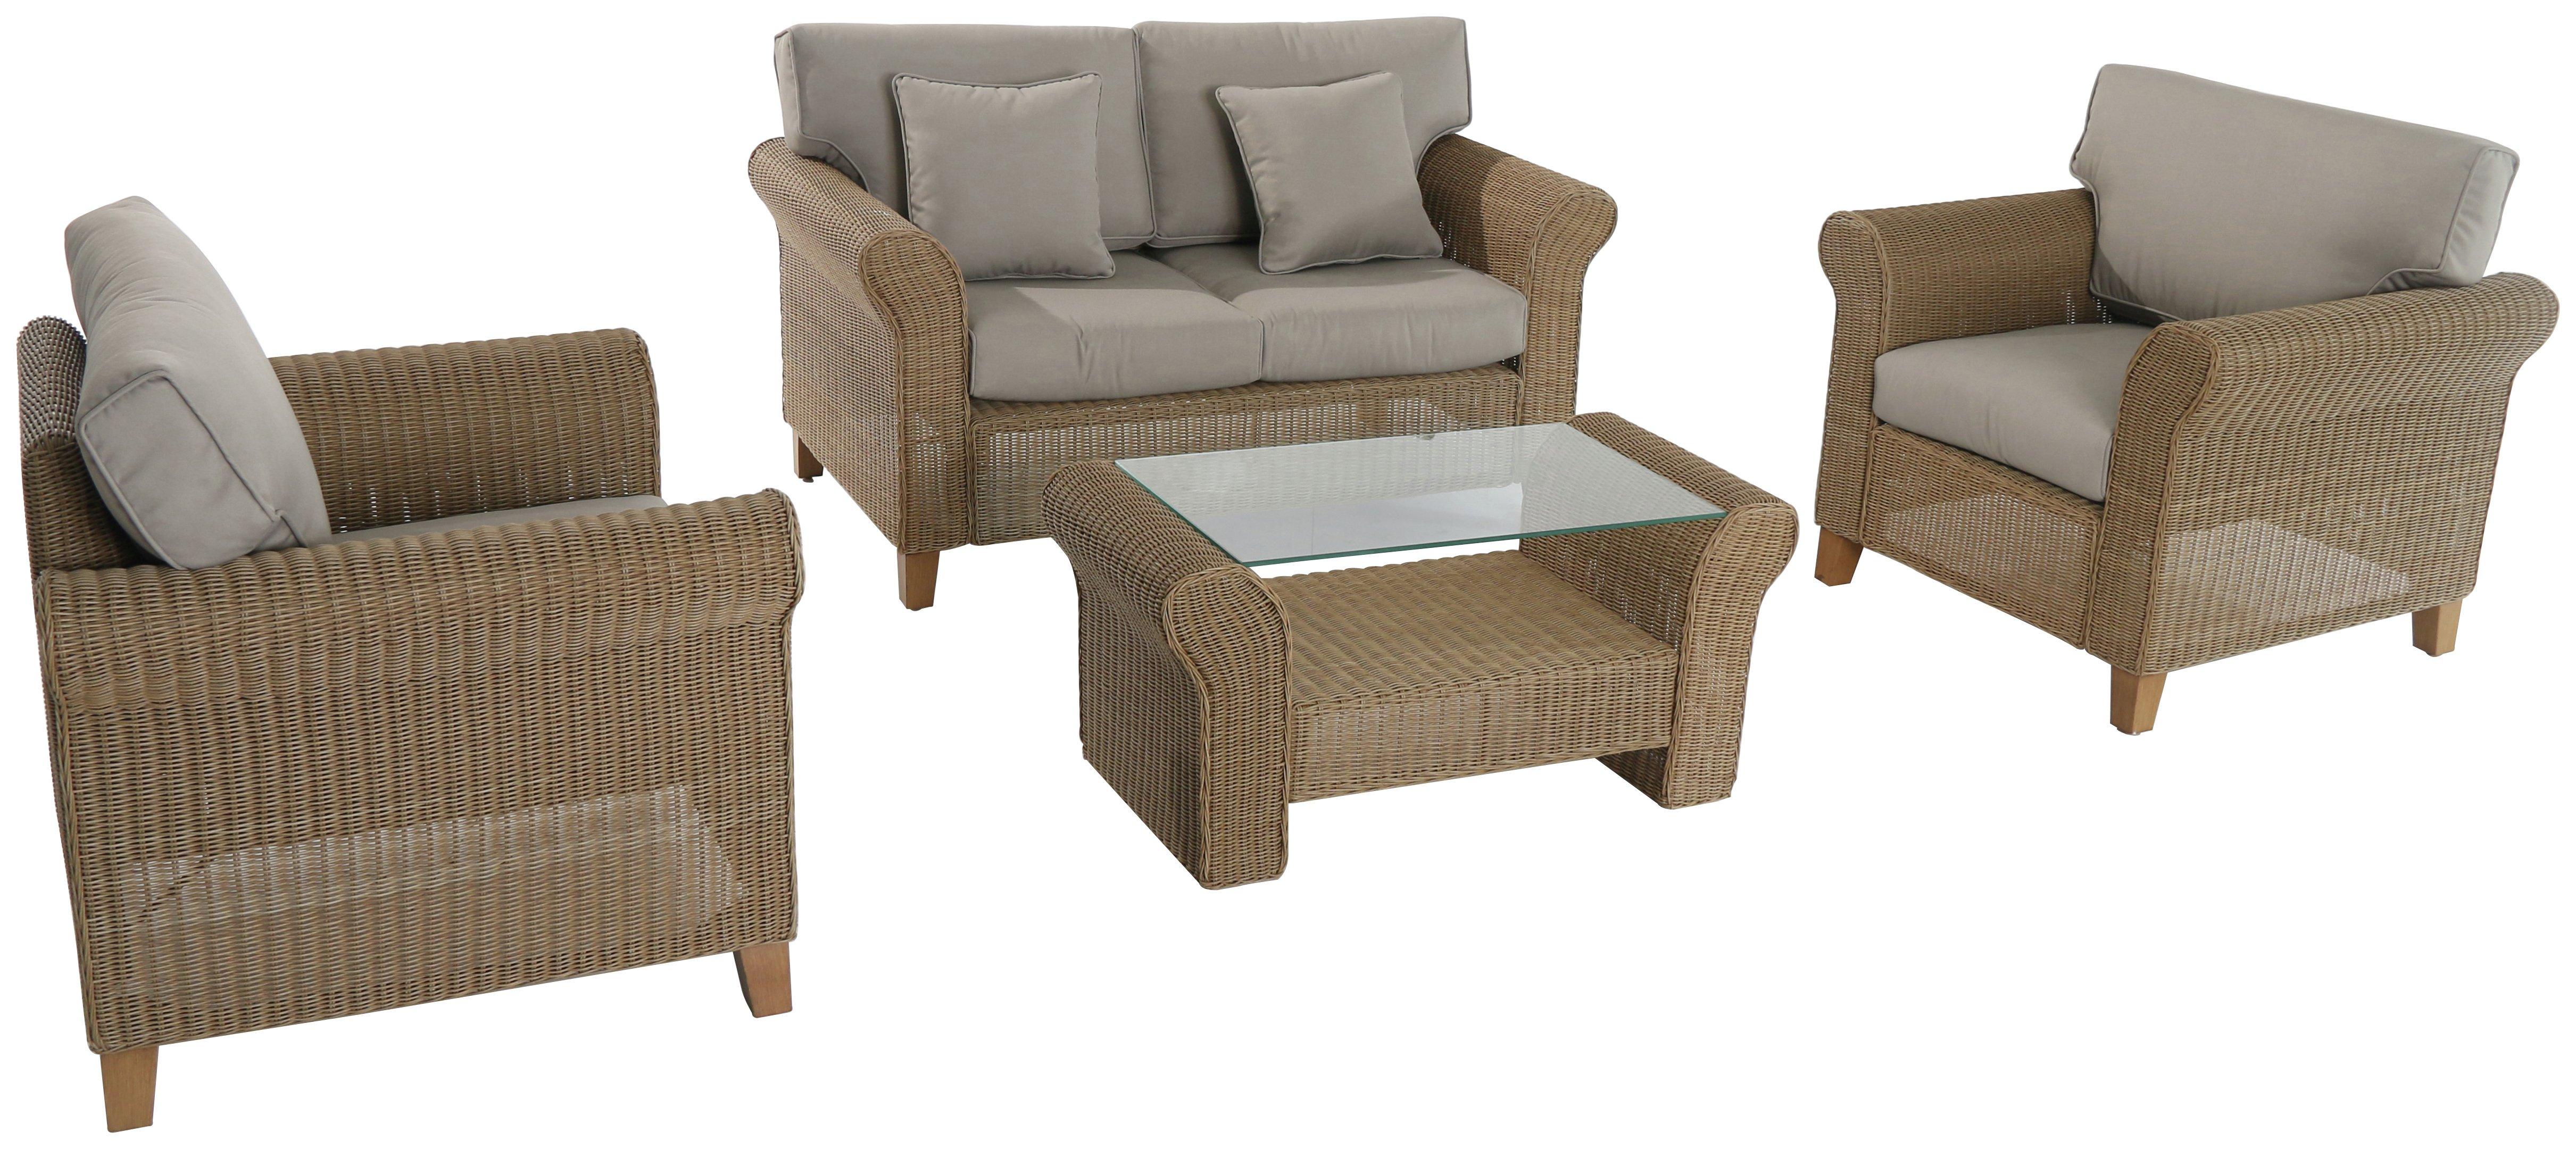 Image of Bordeaux 4 Seater Corner Rattan Conservatory Set